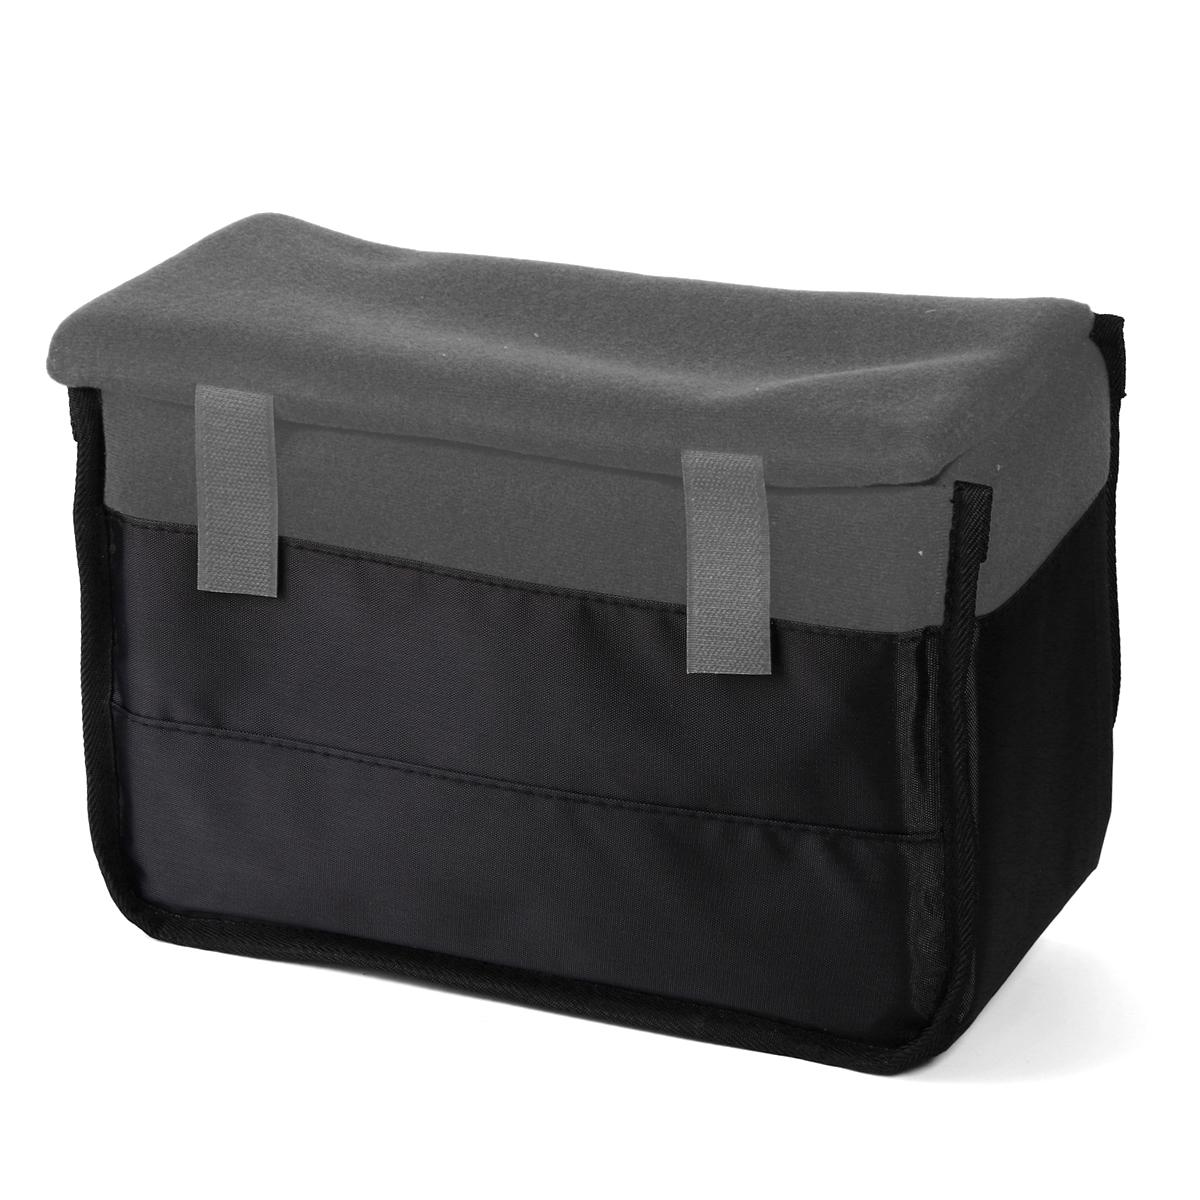 Insert Padded Camera Bag DSLR Inner Folding Divider Partition Protect Case Gray LF680(China (Mainland))